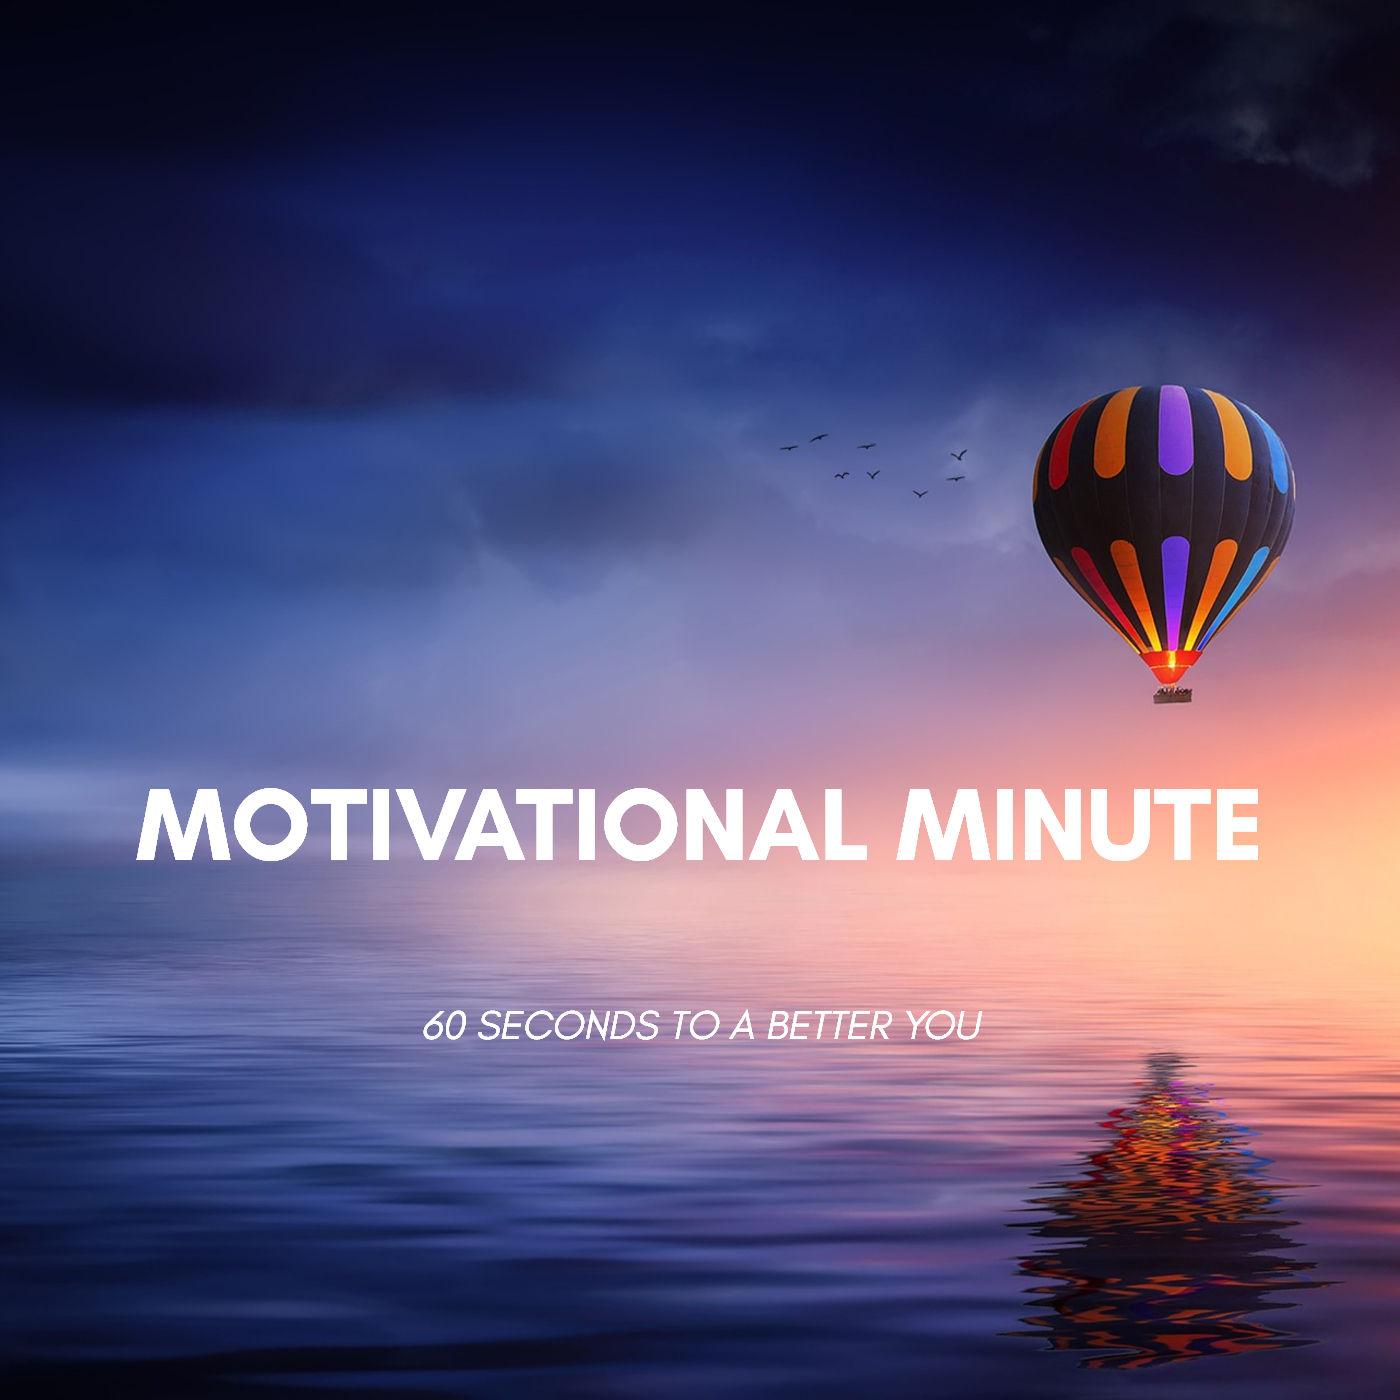 Motivational Minute